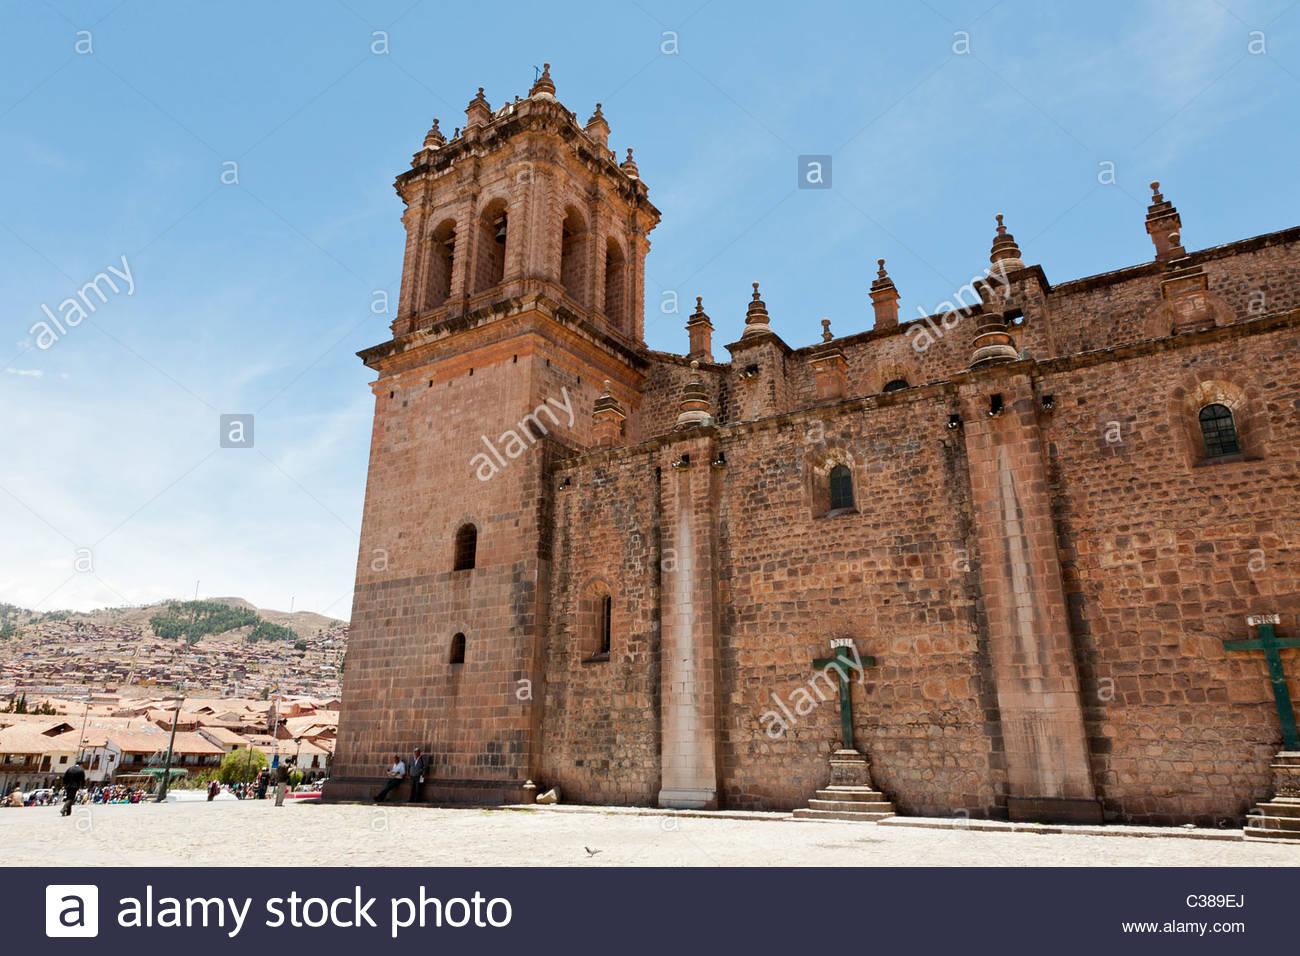 Cusco Cathedral on Plaza de Armas, Cusco, Peru. Stock Photo